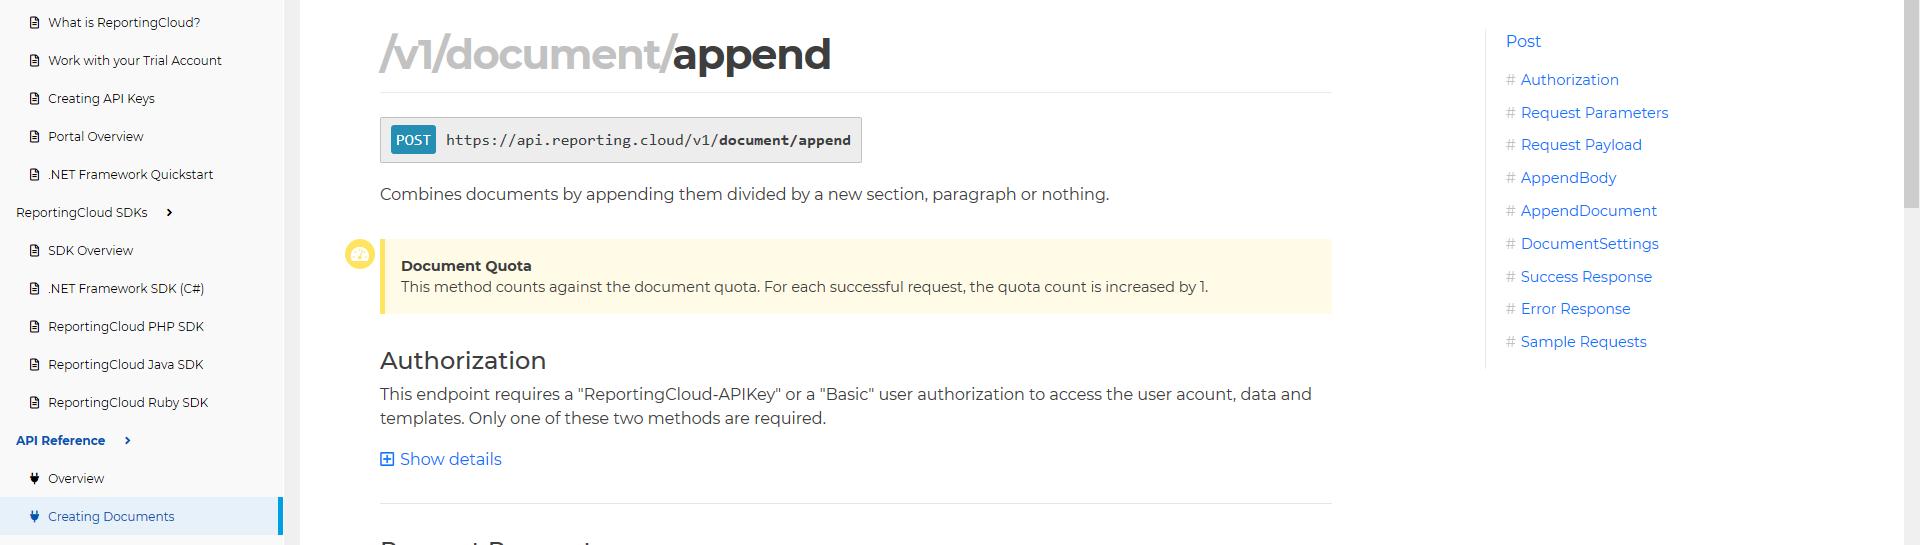 ReportingCloud Docs